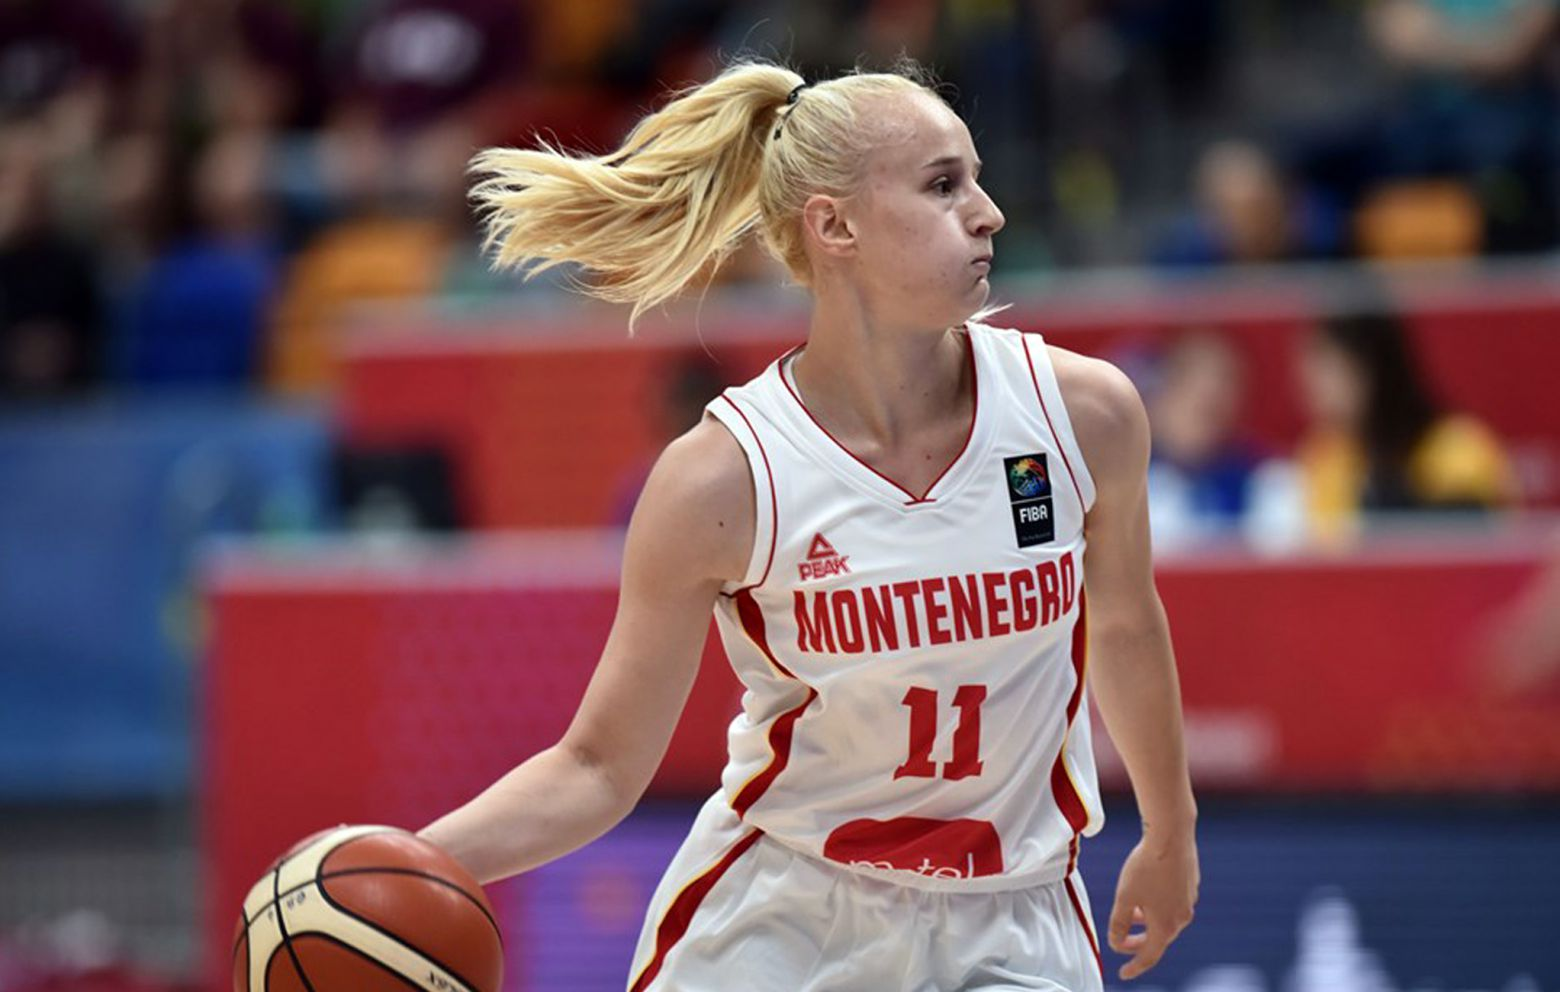 BOZICA MUJOVIC has signed with Wisla Krakow